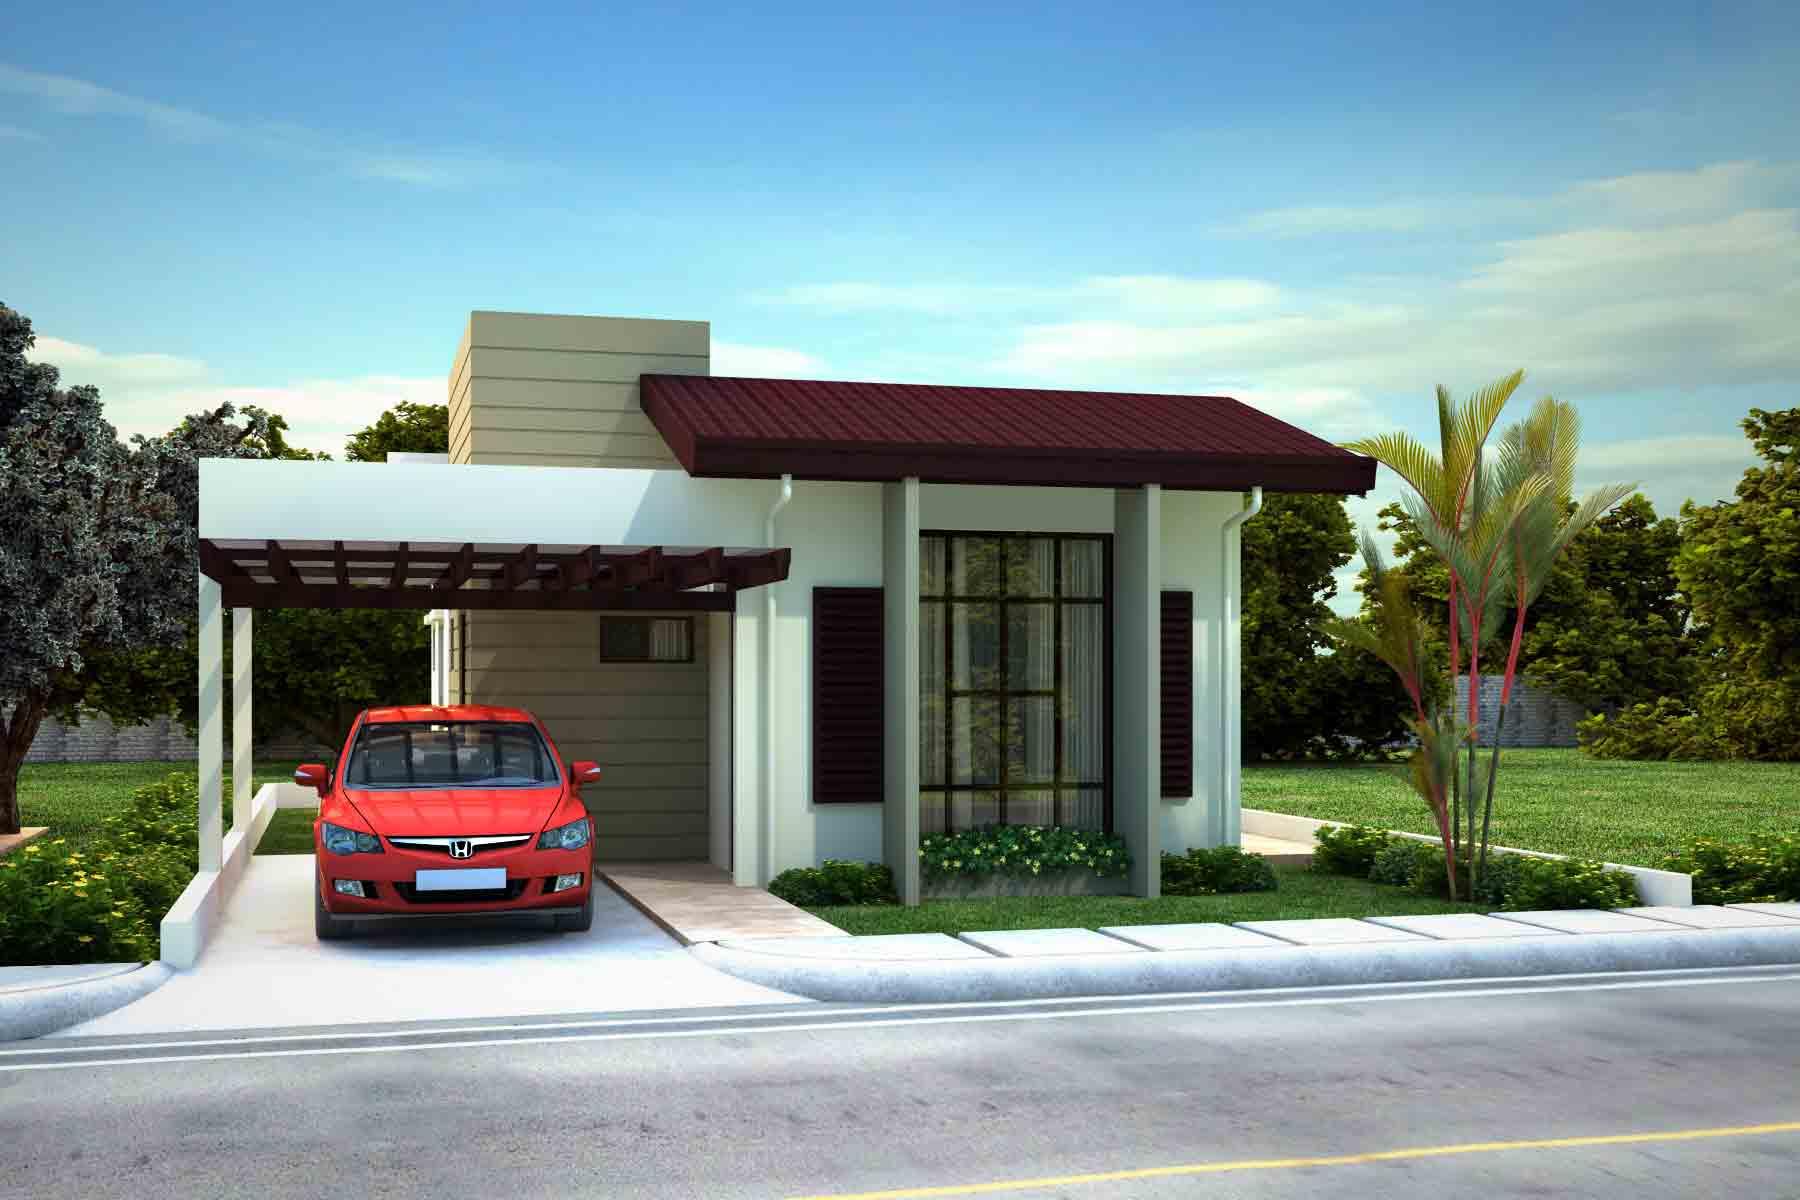 St james subdivision naga city real estate - Camella homes bungalow house design ...